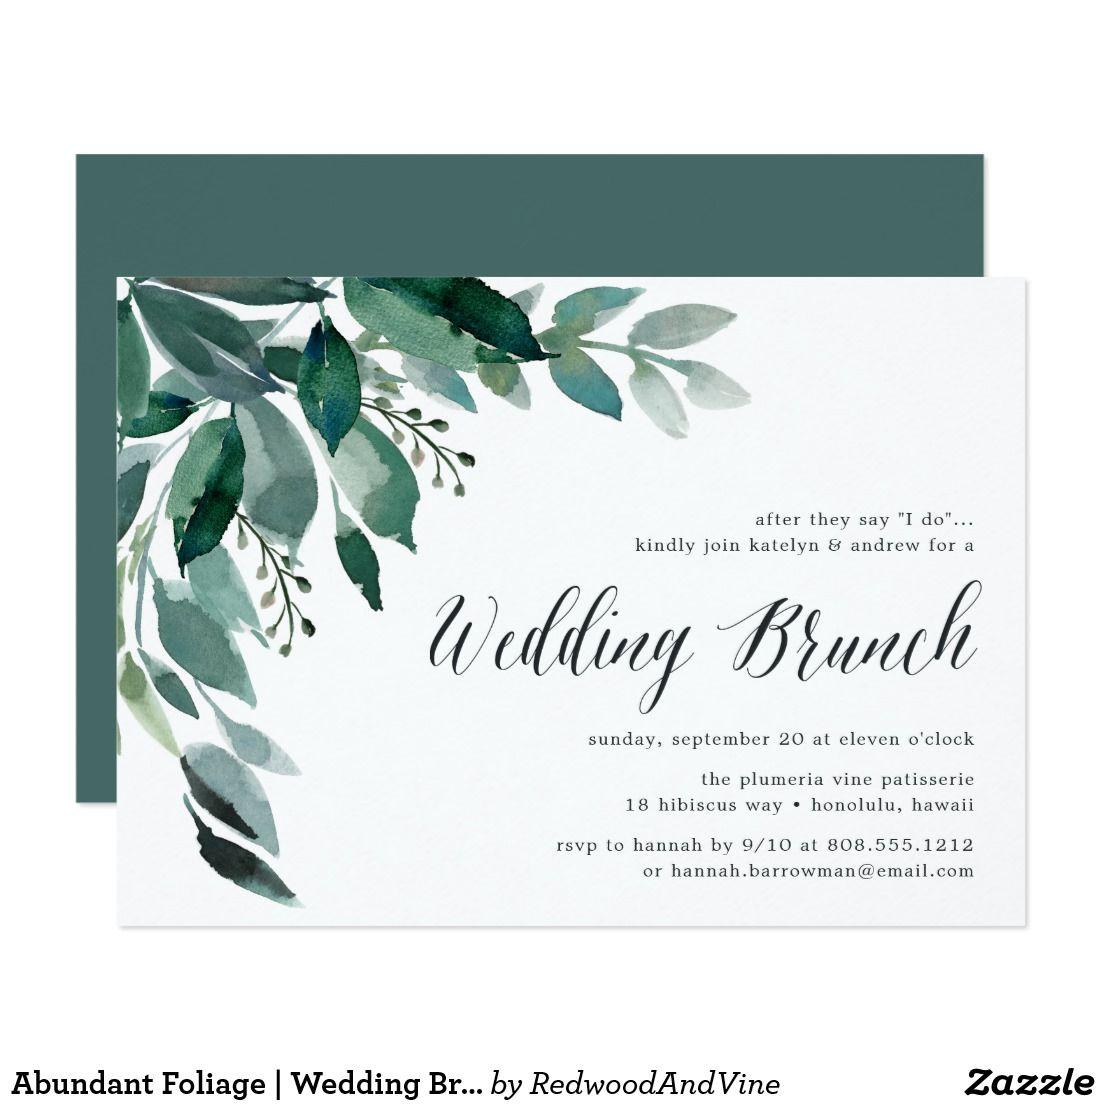 Abundant Foliage Wedding Brunch Invitation Brunch Invitations